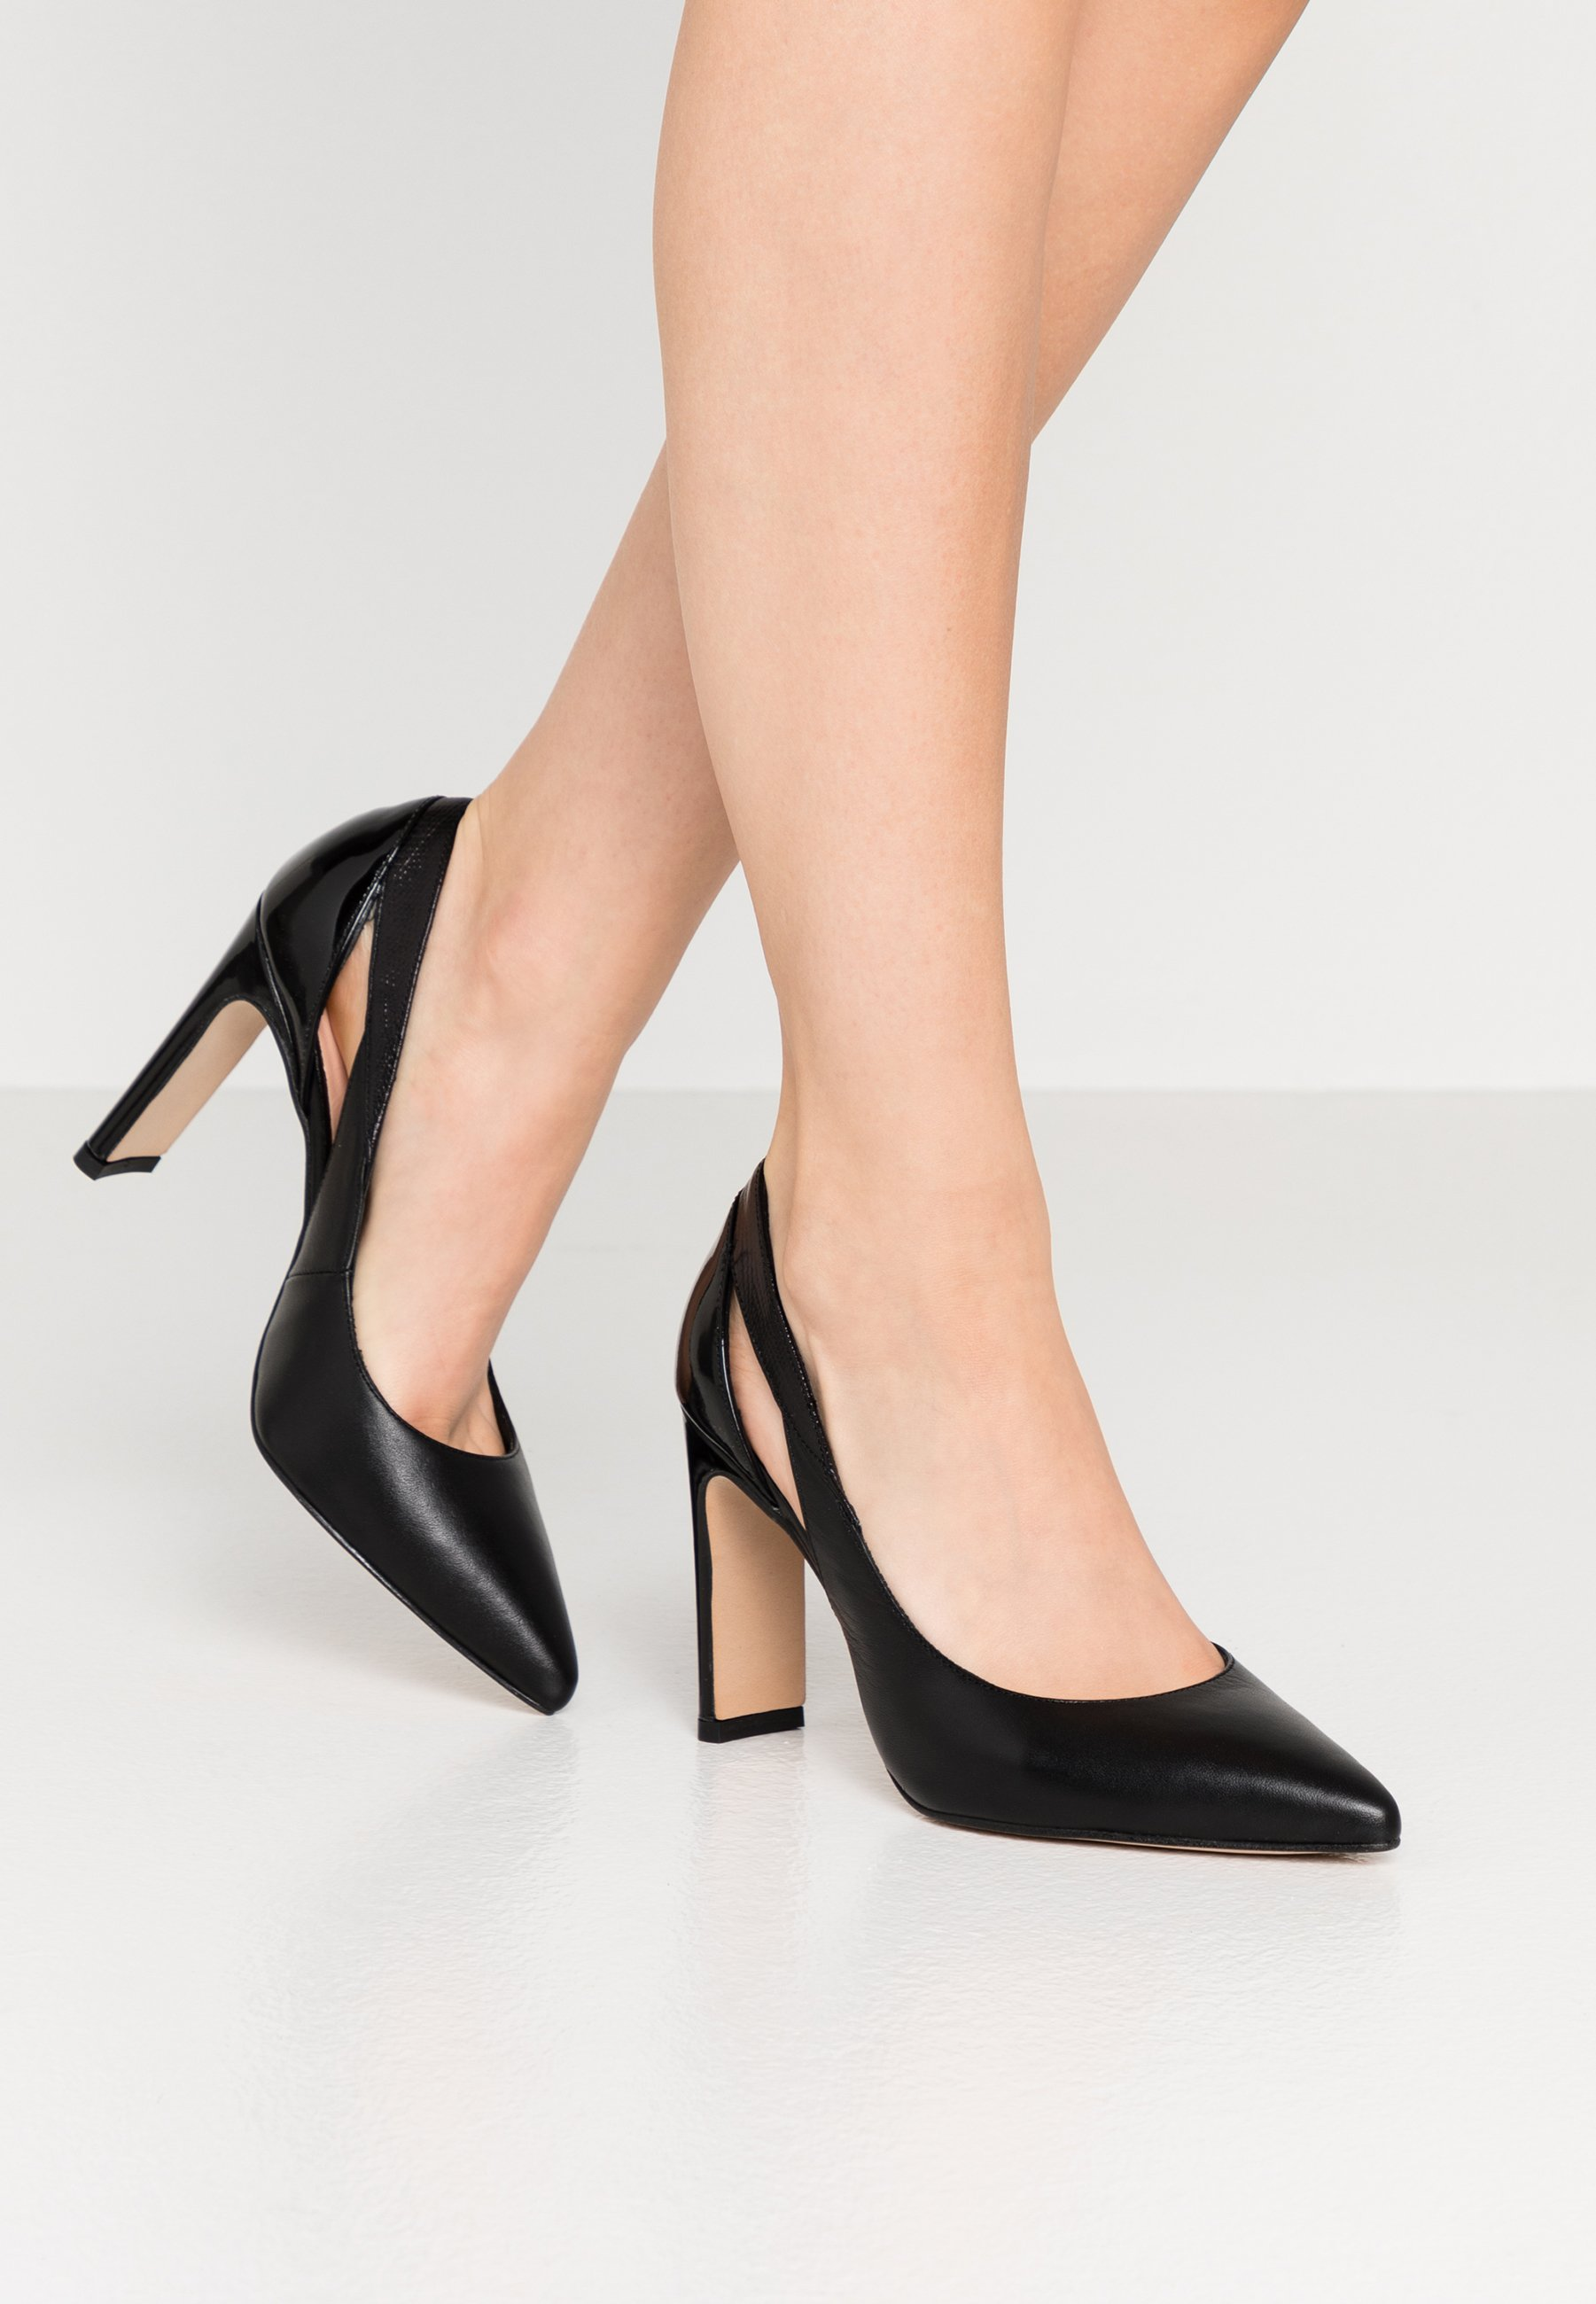 Precio de fábrica Zign Zapatos altos - black   Calzado de mujer2020 snAXm